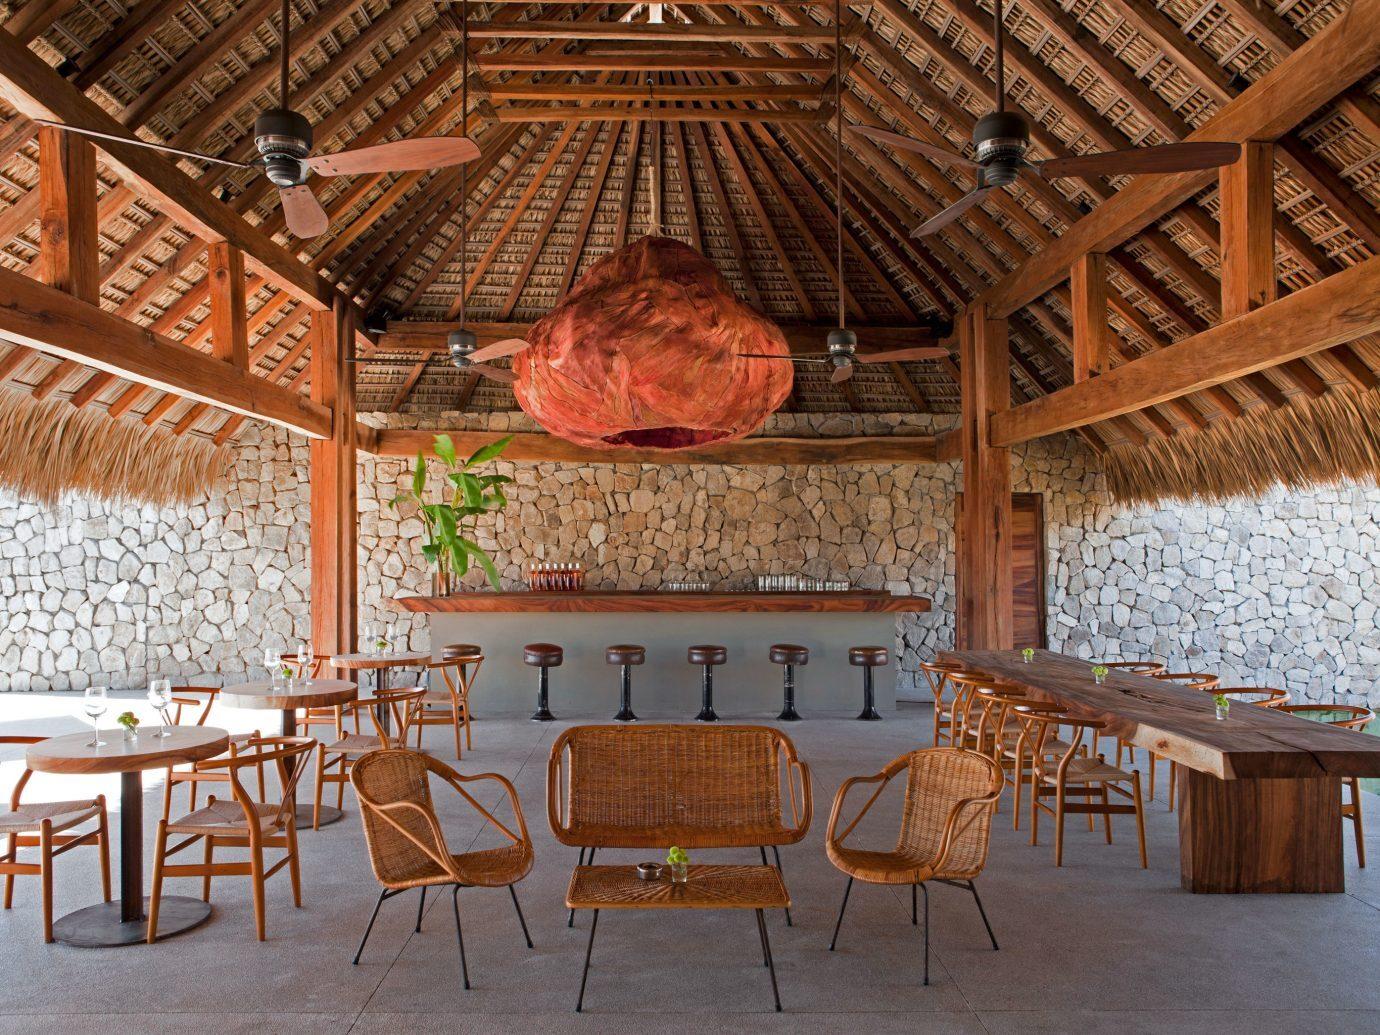 Outdoor bar at Hotel Escondido, Puerto Escondido